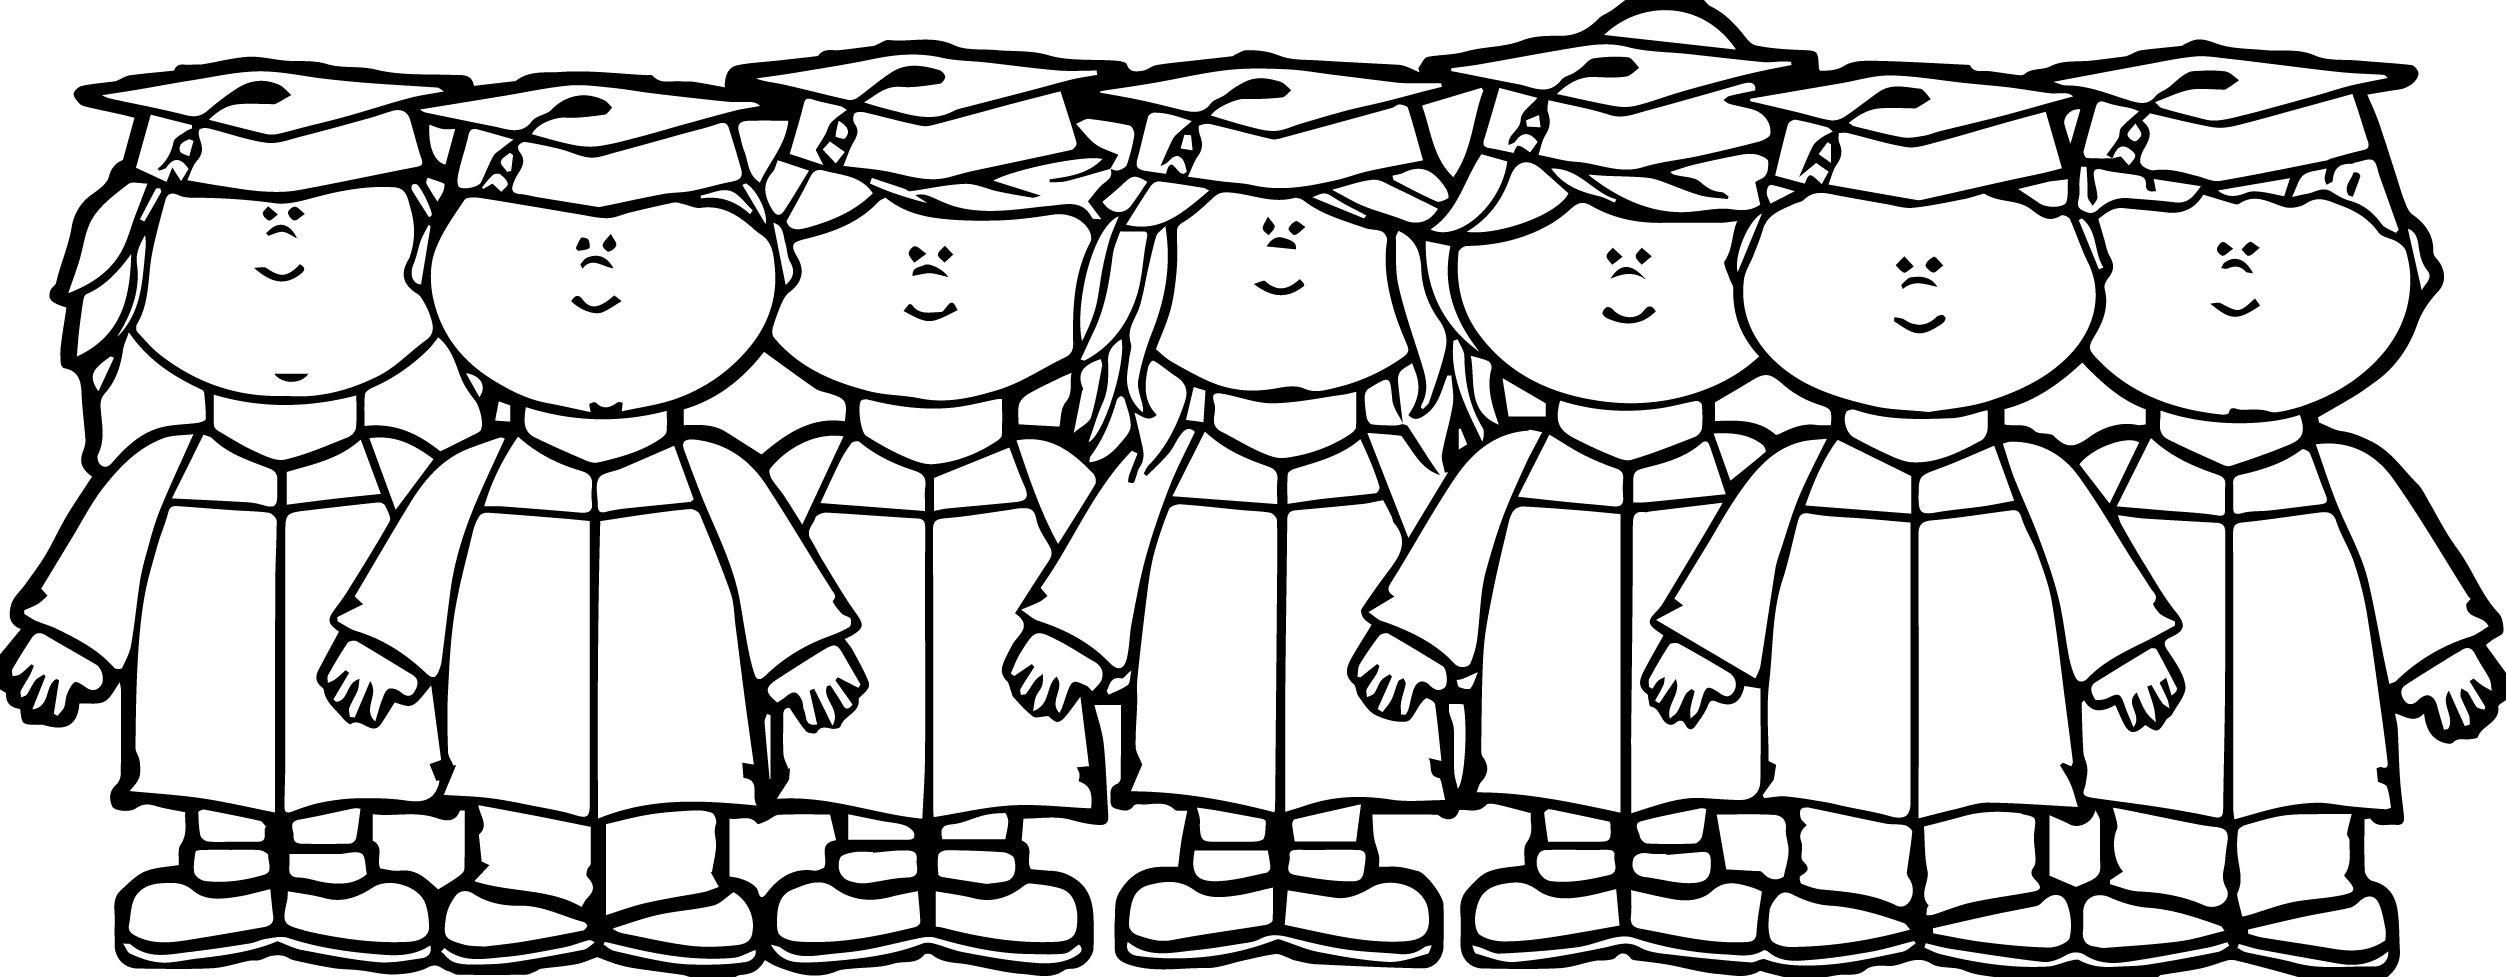 Kids Graduation Clip Art Kids Graduation Image Kids We